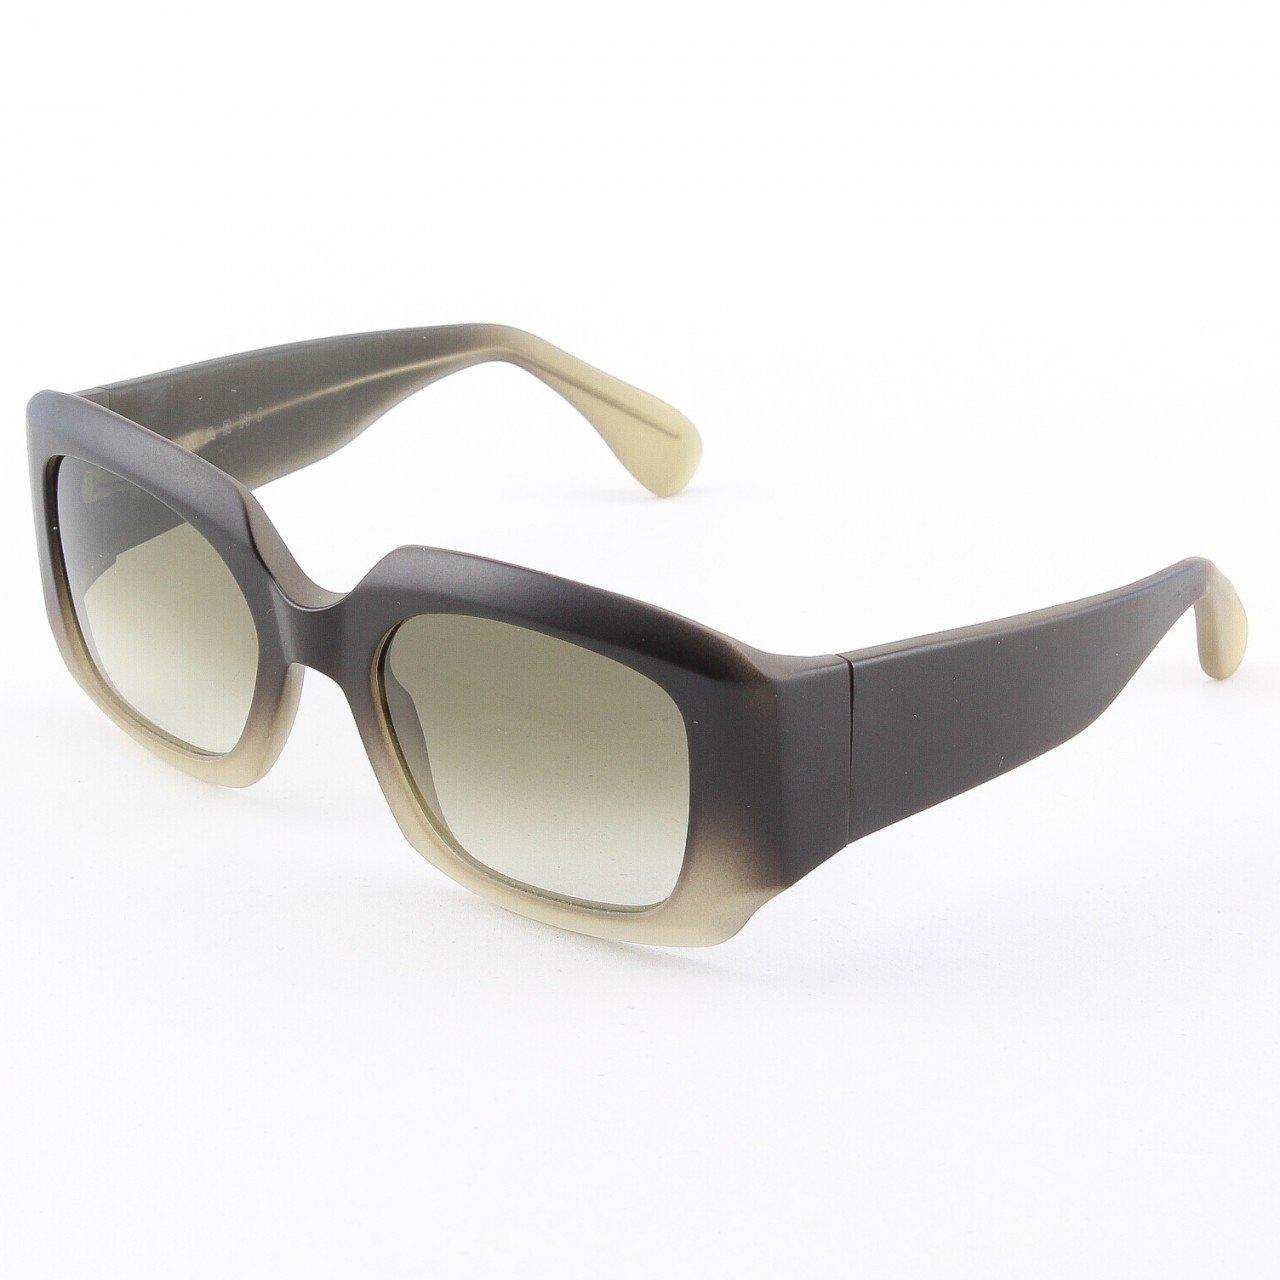 Marni MA129S Sunglasses Col. 15 Opaque Dark Brown Cream Graduation with Brown Gradient Lenses